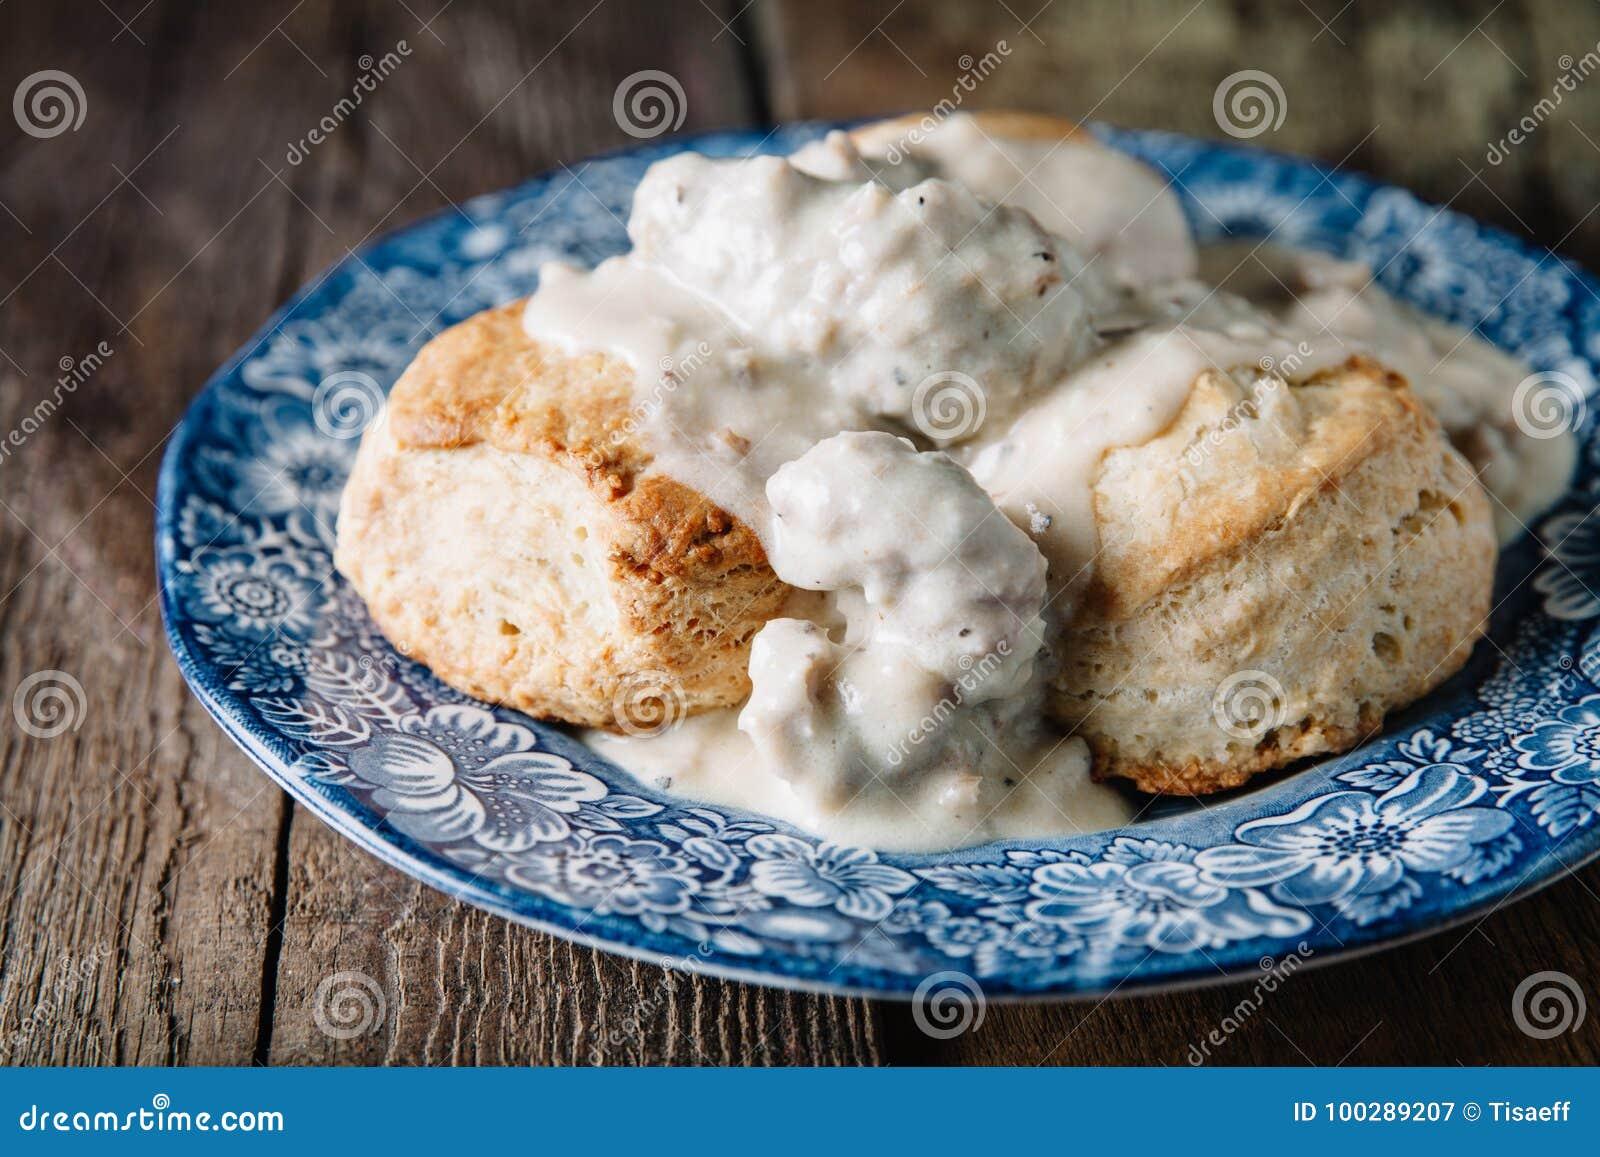 Biscuits et sauce au jus